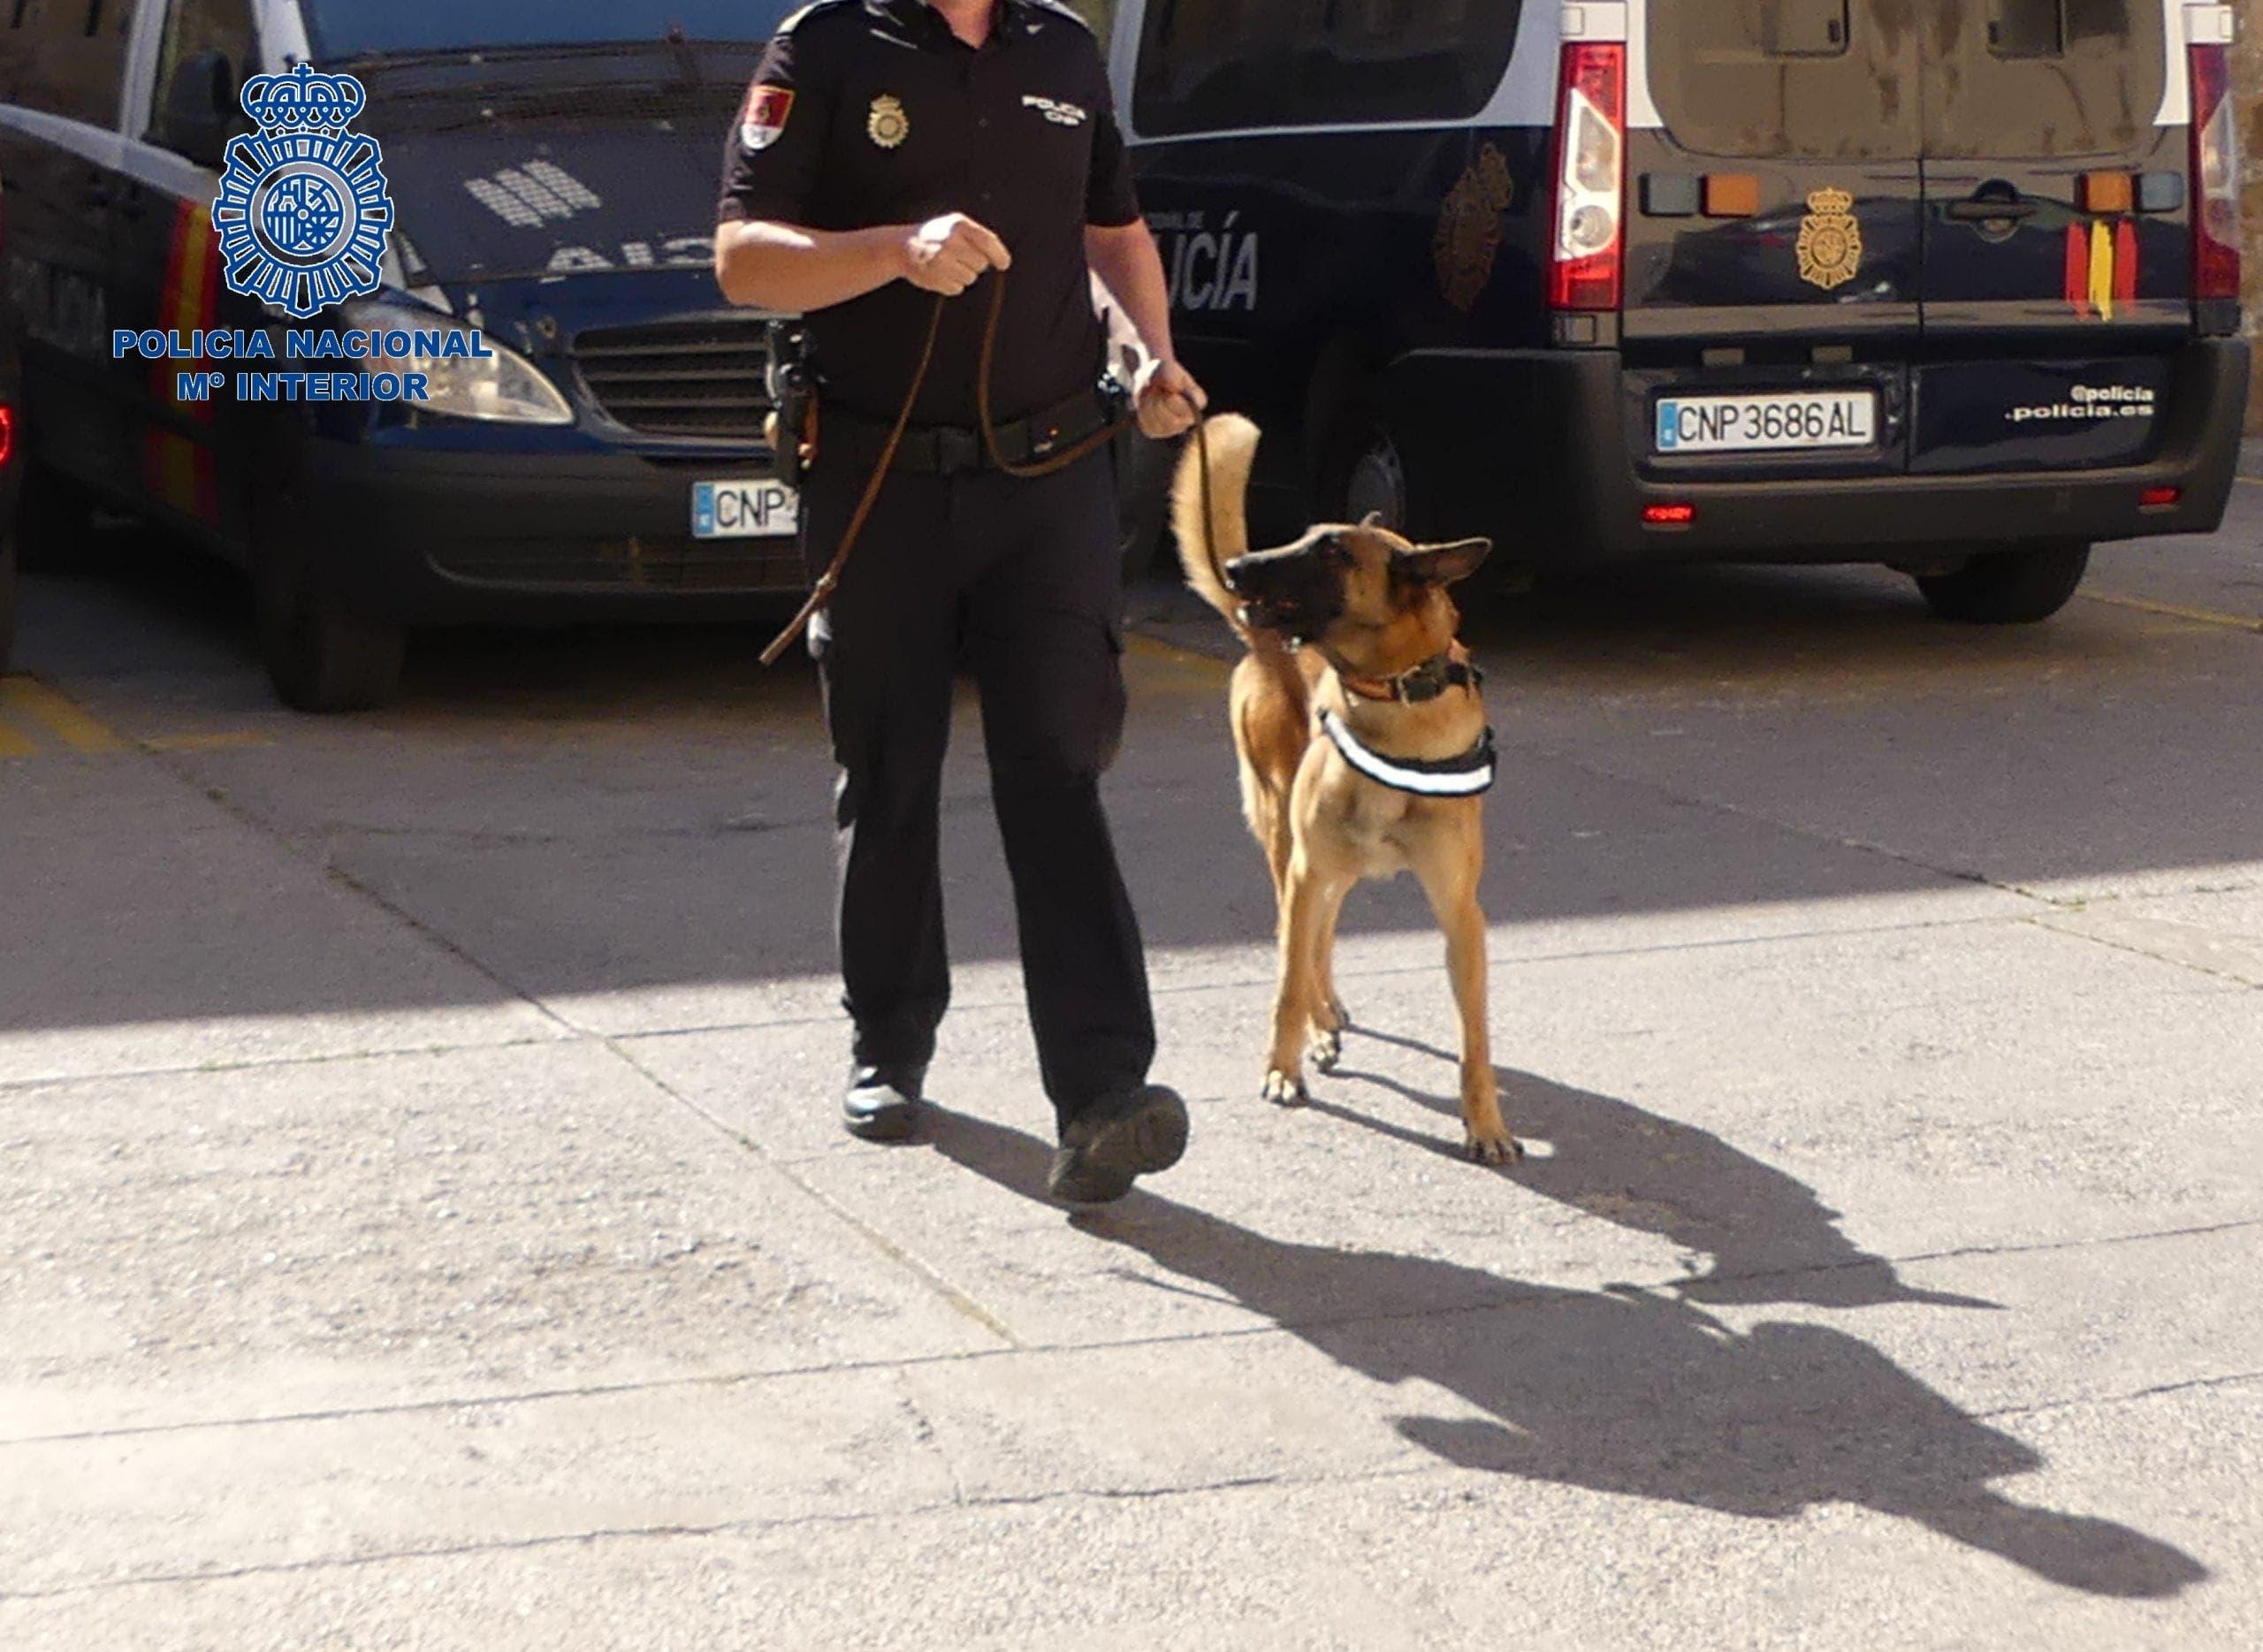 Policia Nacional Dog